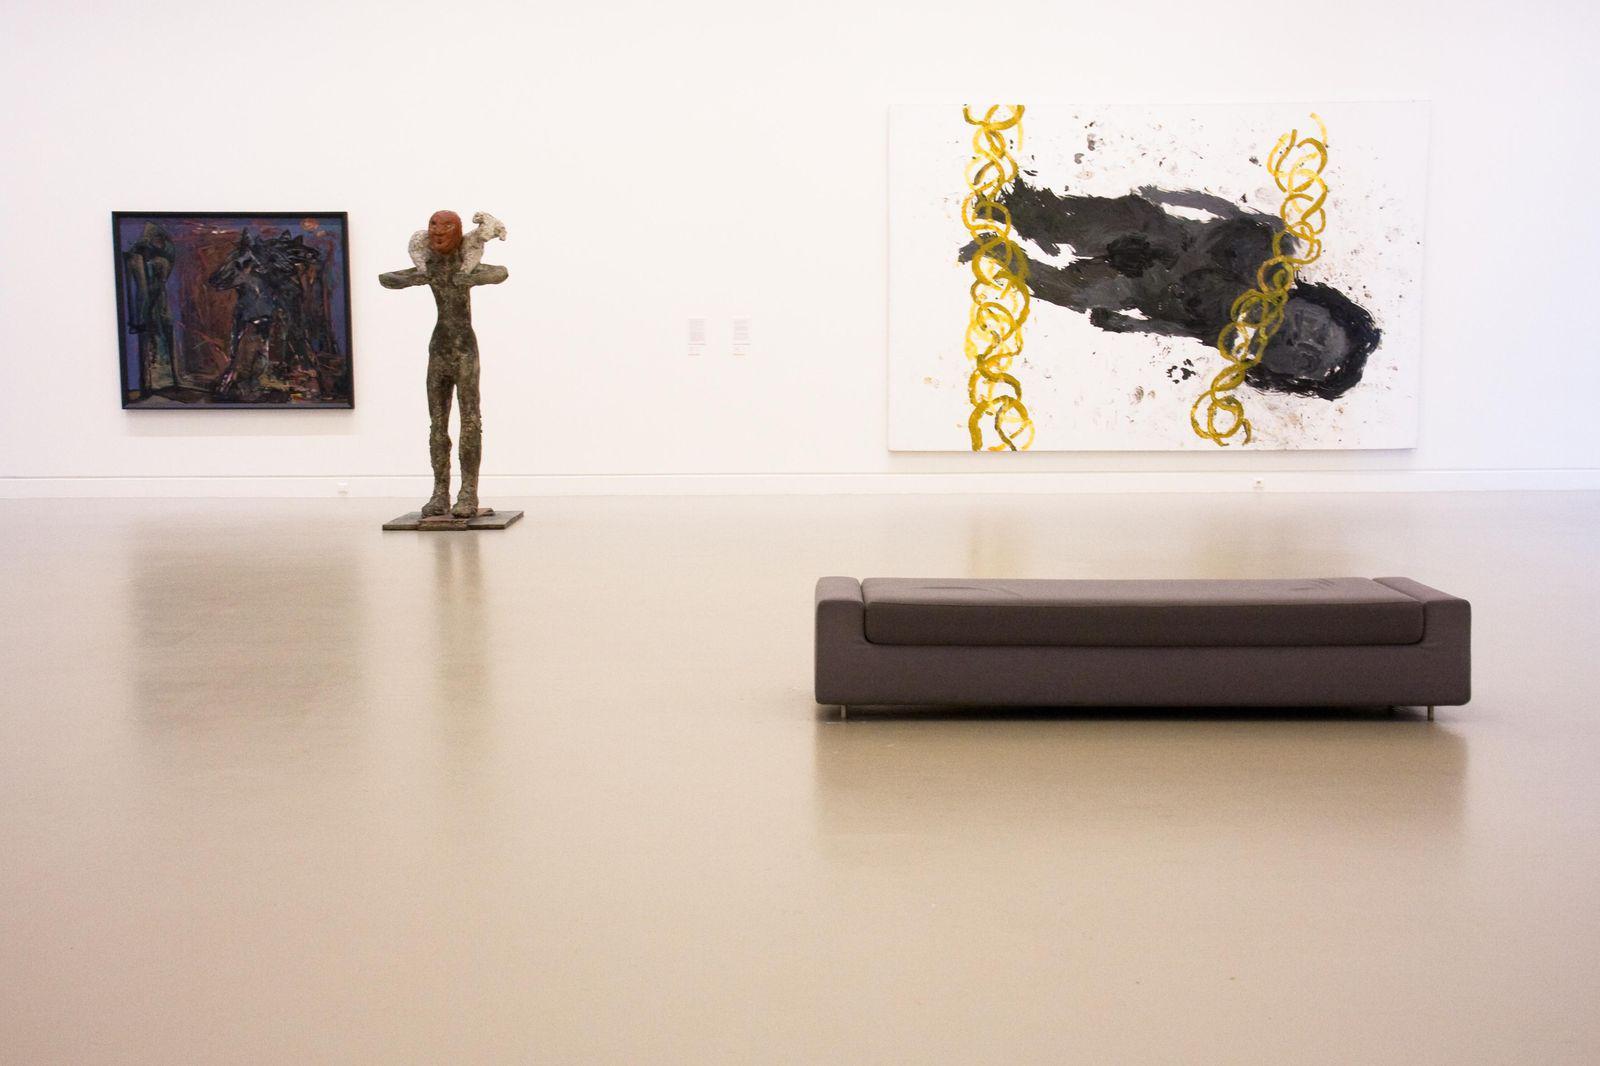 Musée d'art Moderne et contemporain_Strasbourg